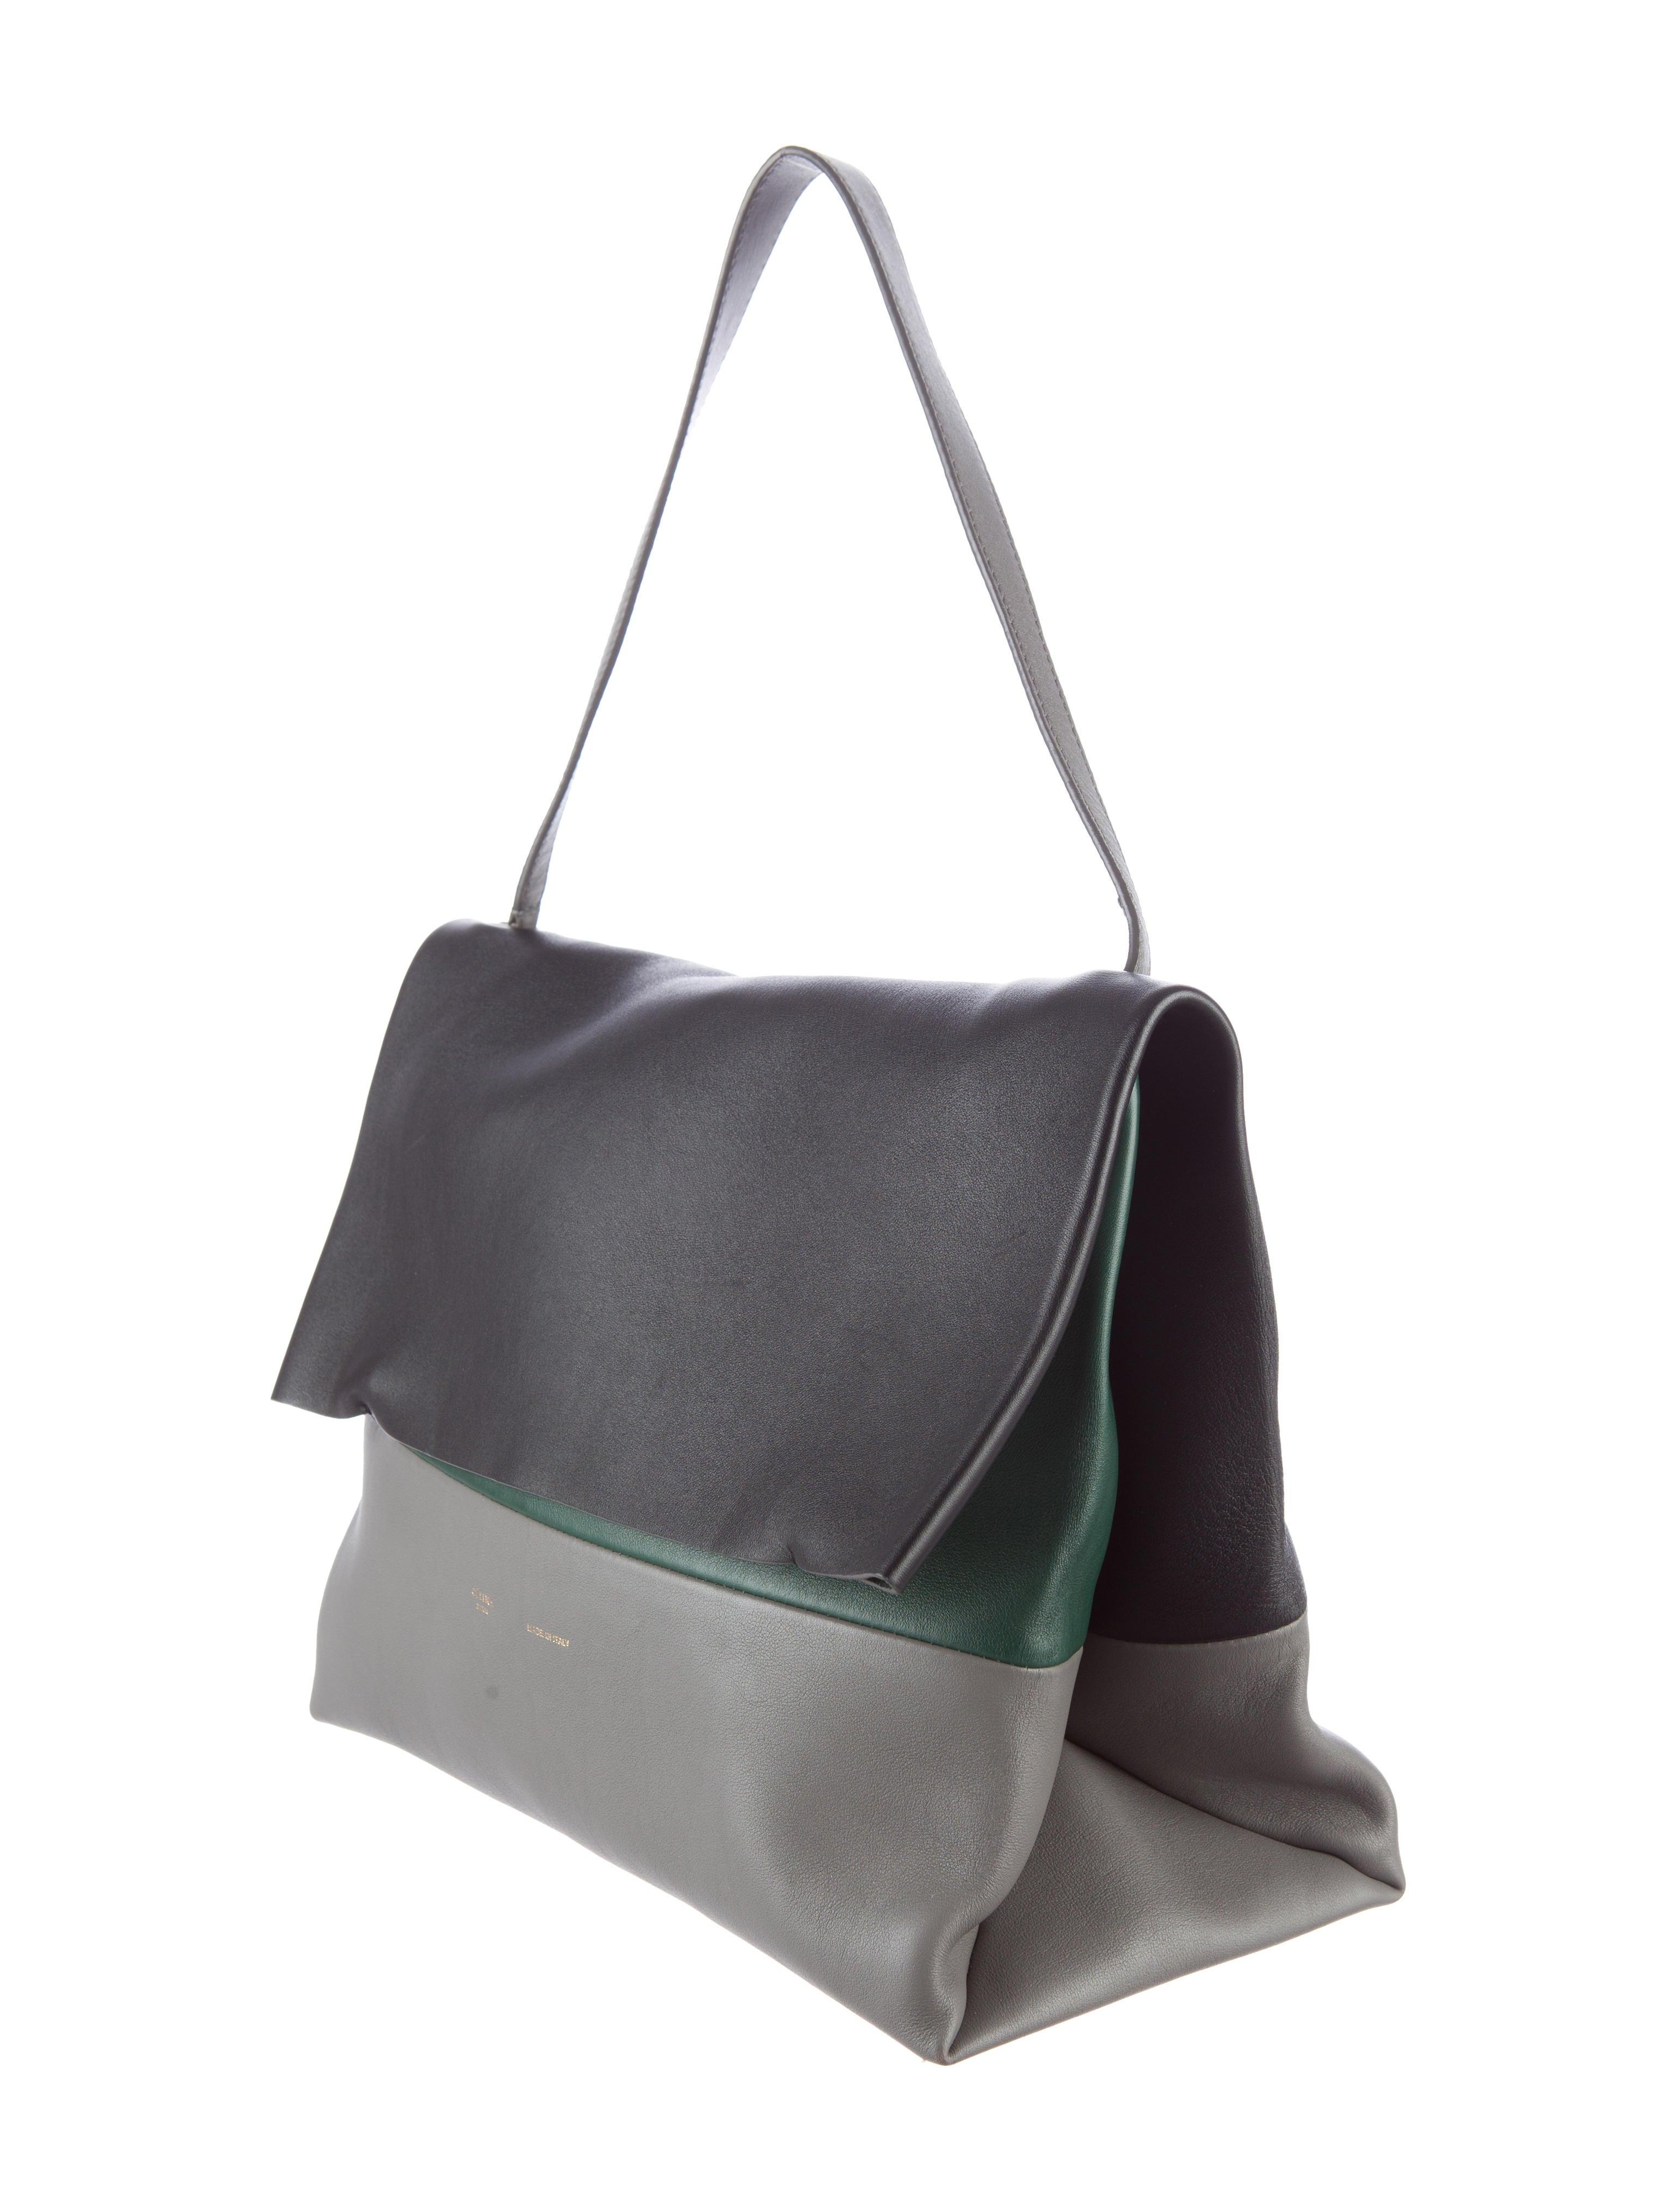 where to buy celine handbags online - C��line All Soft Tote - Handbags - CEL33084 | The RealReal